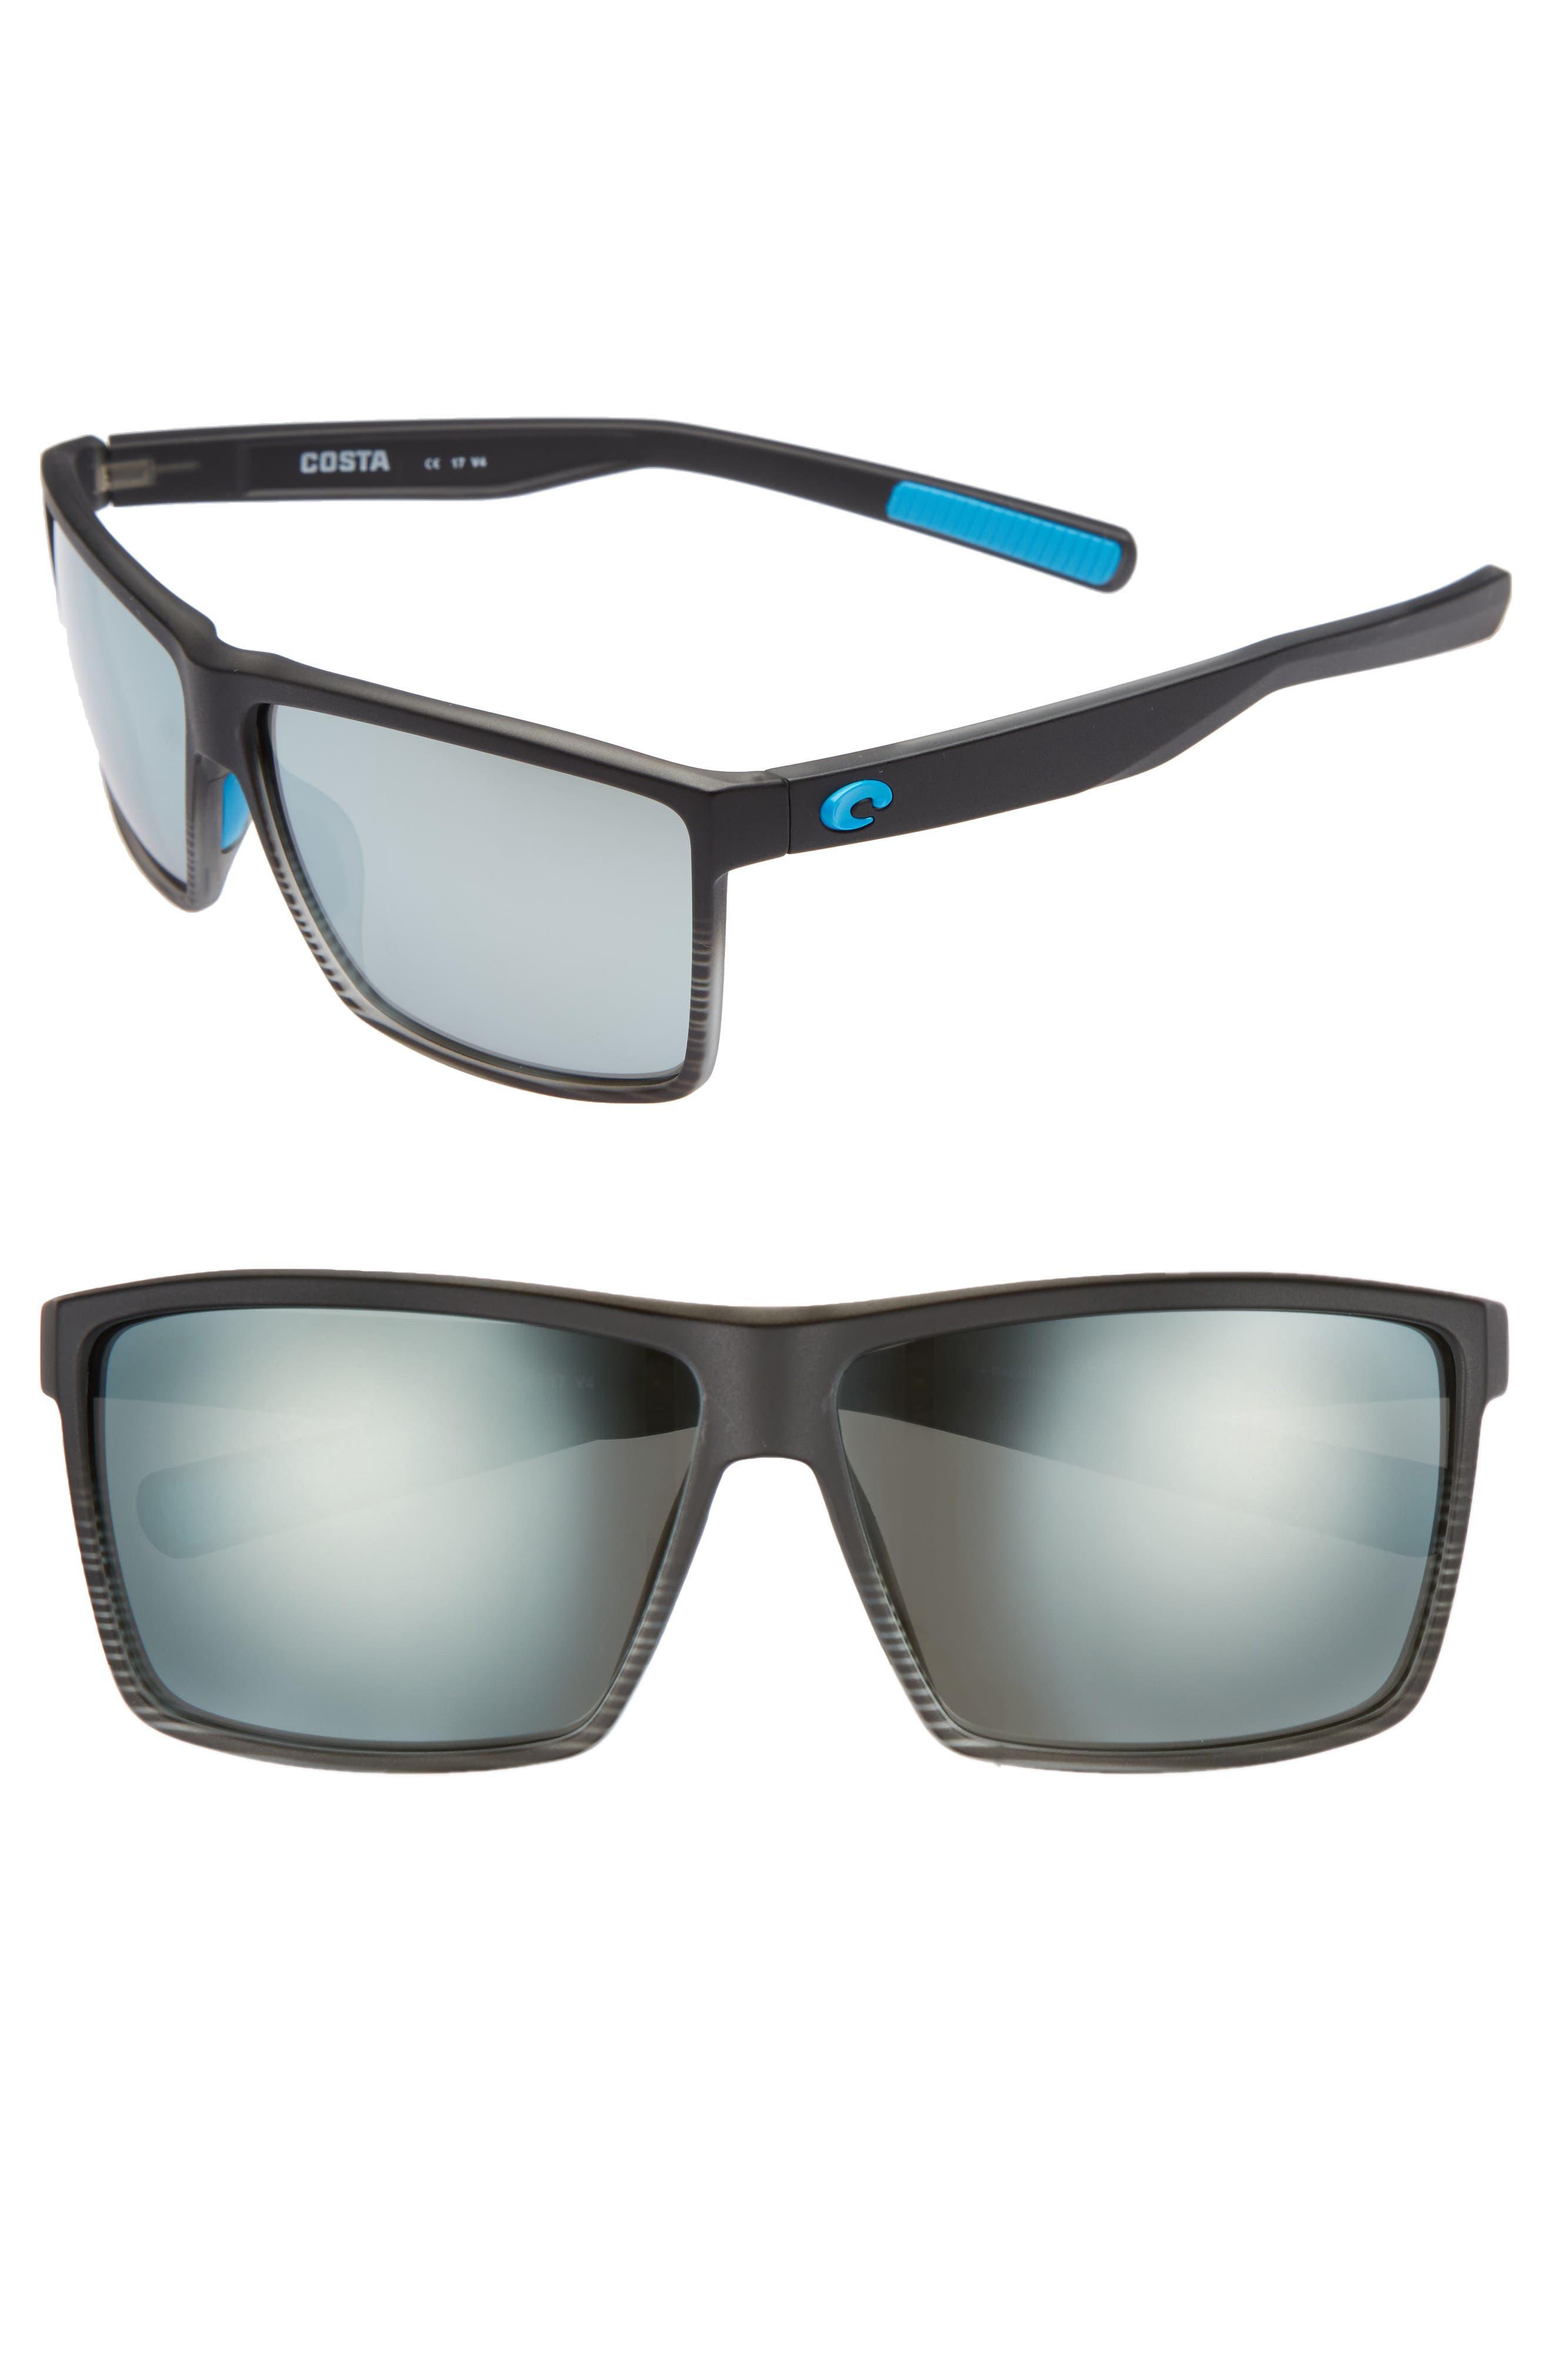 Rincon 60mm Polarized Sunglasses,                             Main thumbnail 1, color,                             SMOKE CRYSTAL/ SILVER MIRROR